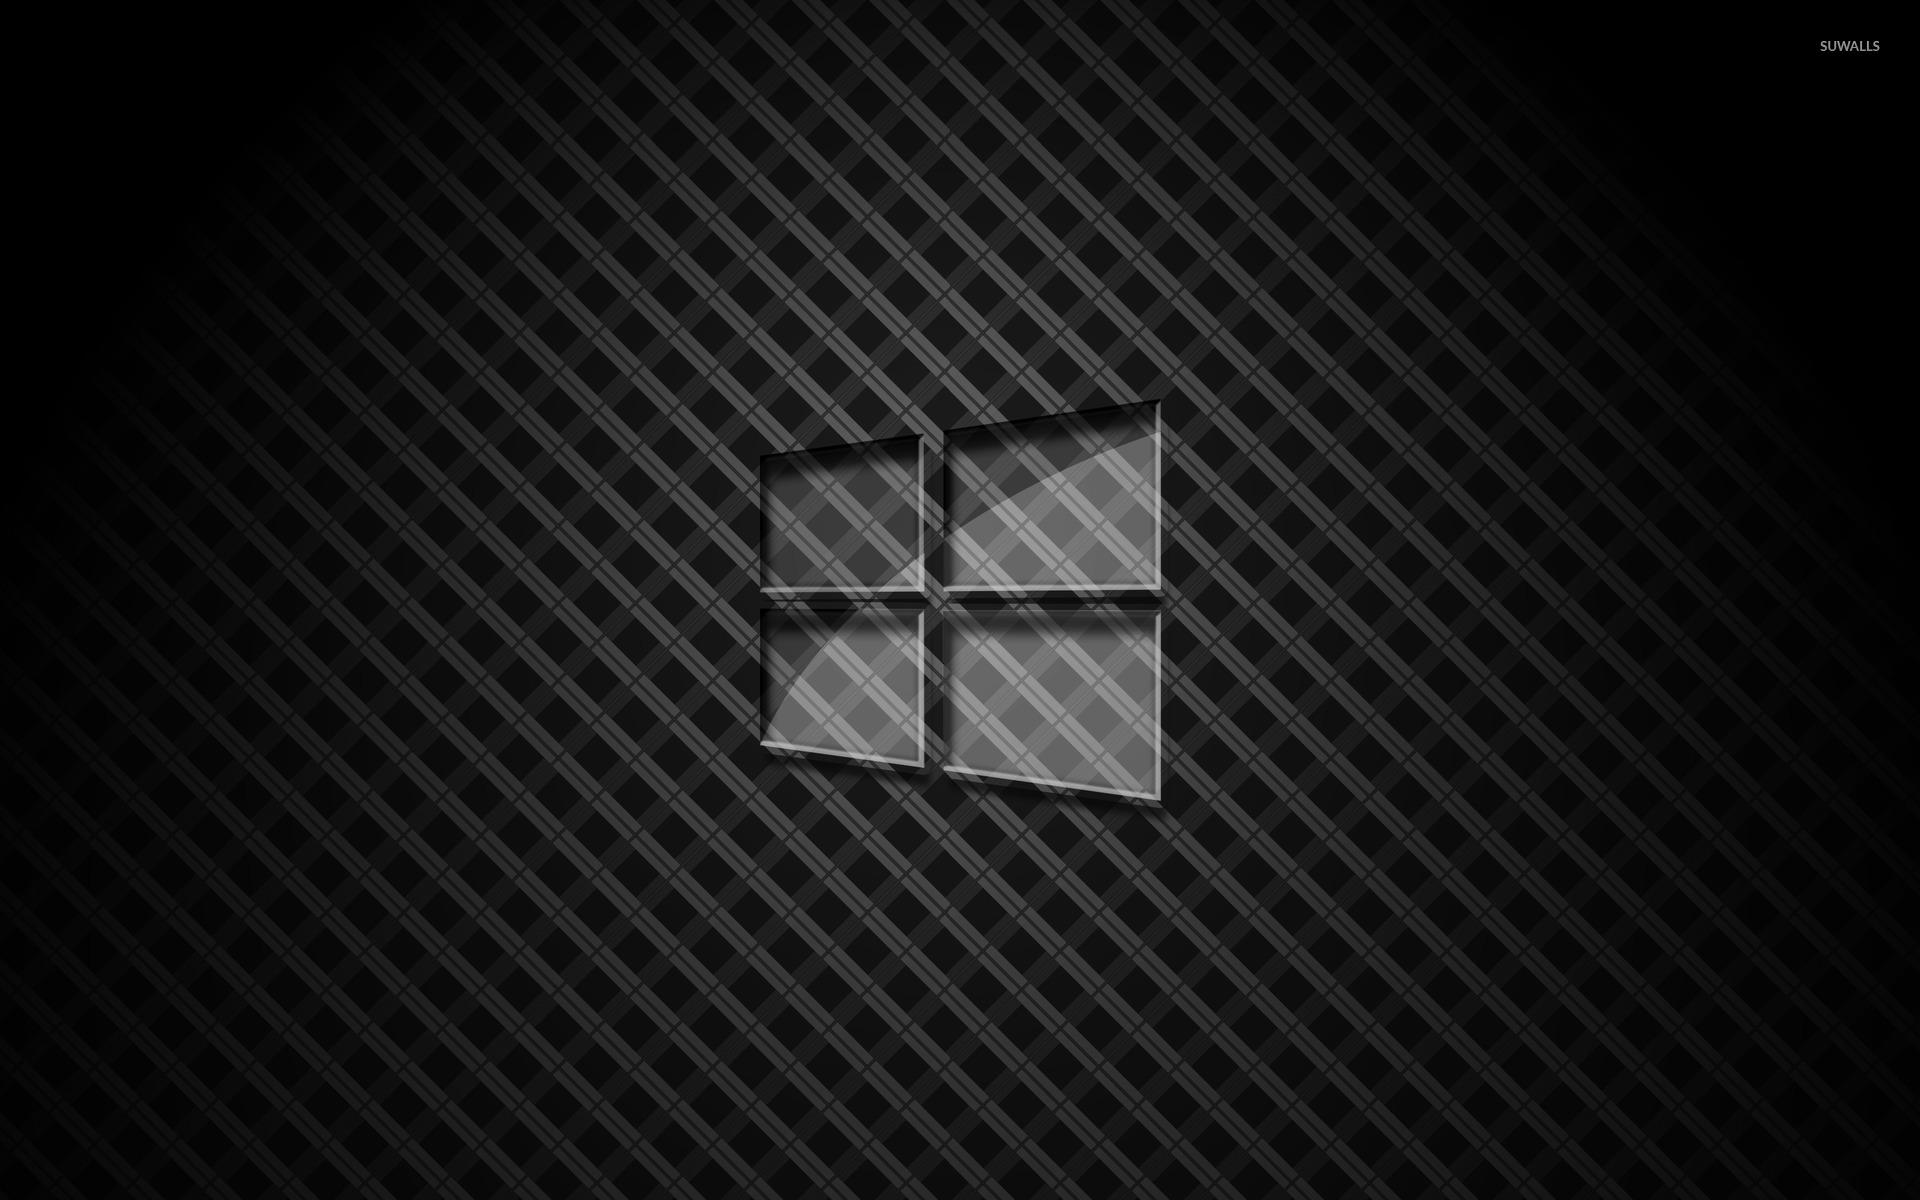 Glass Windows 10 Wallpaper : Glass windows on square pattern wallpaper